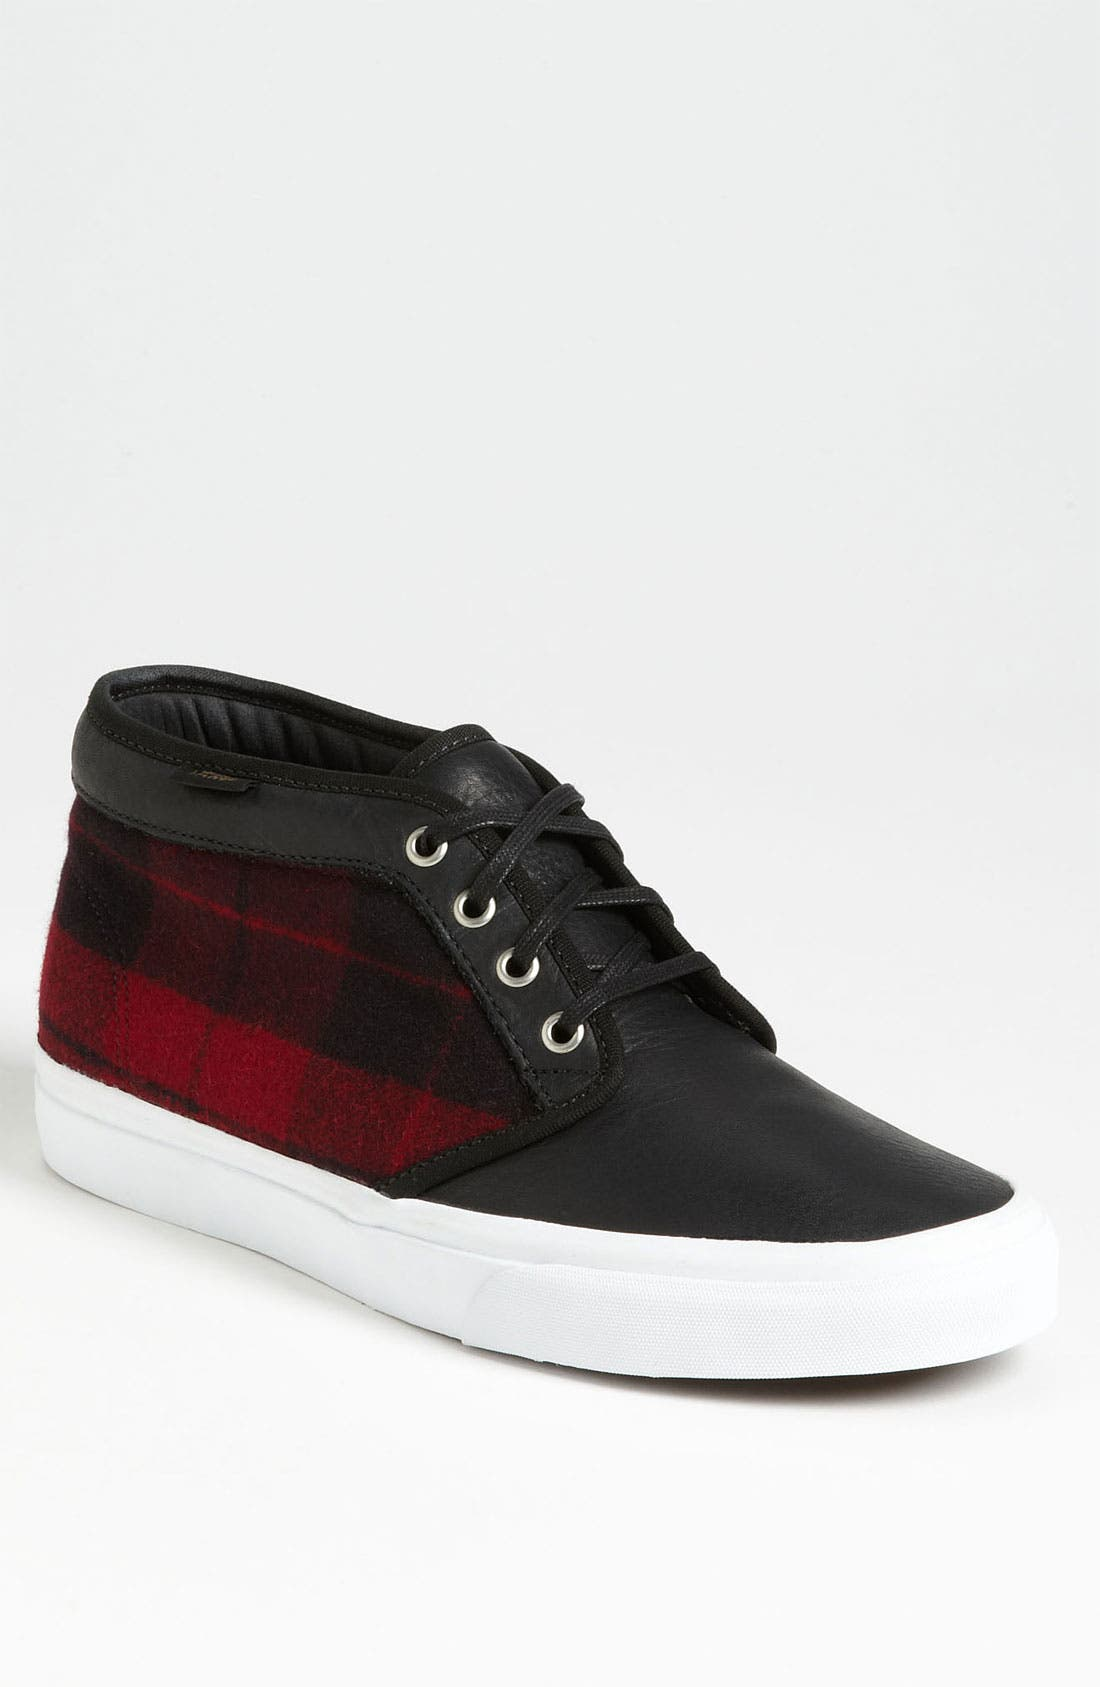 Alternate Image 1 Selected - Vans 'Cali - Chukka' Sneaker (Men)